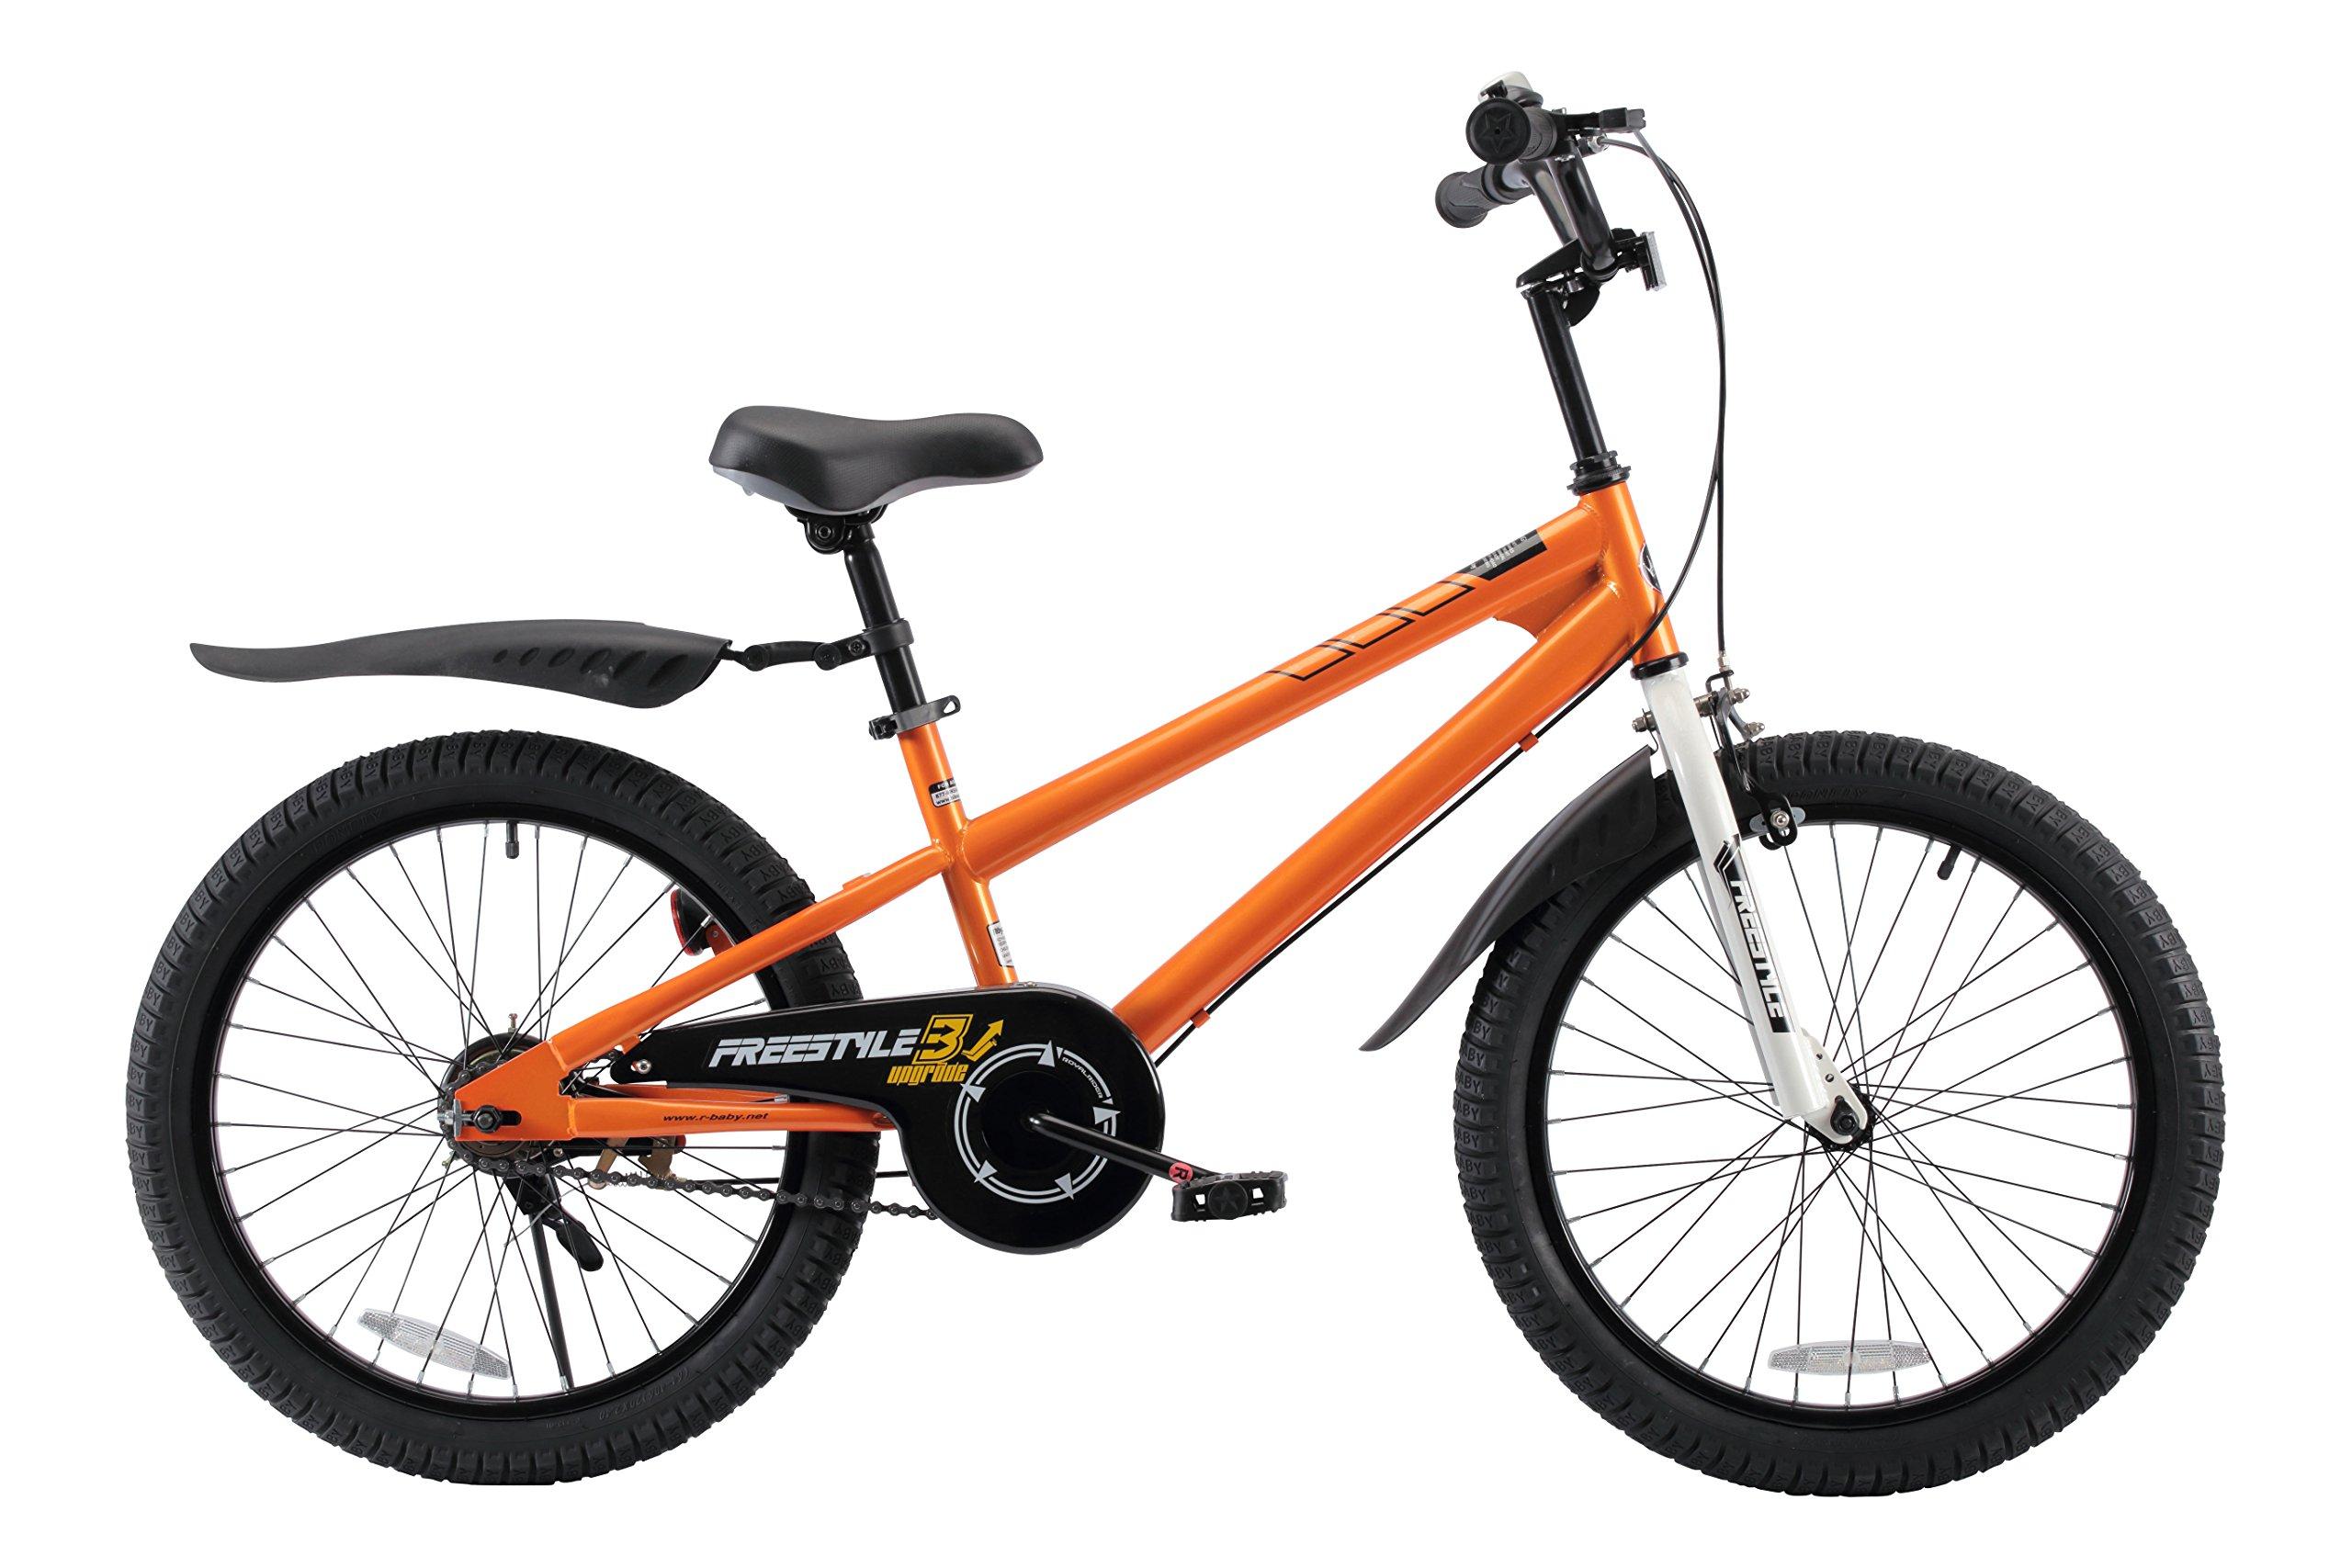 RoyalBaby BMX Freestyle Kids Bike, Boy's Bikes and Girl's Bikes, Gifts for children, 20 inch wheels, Orange